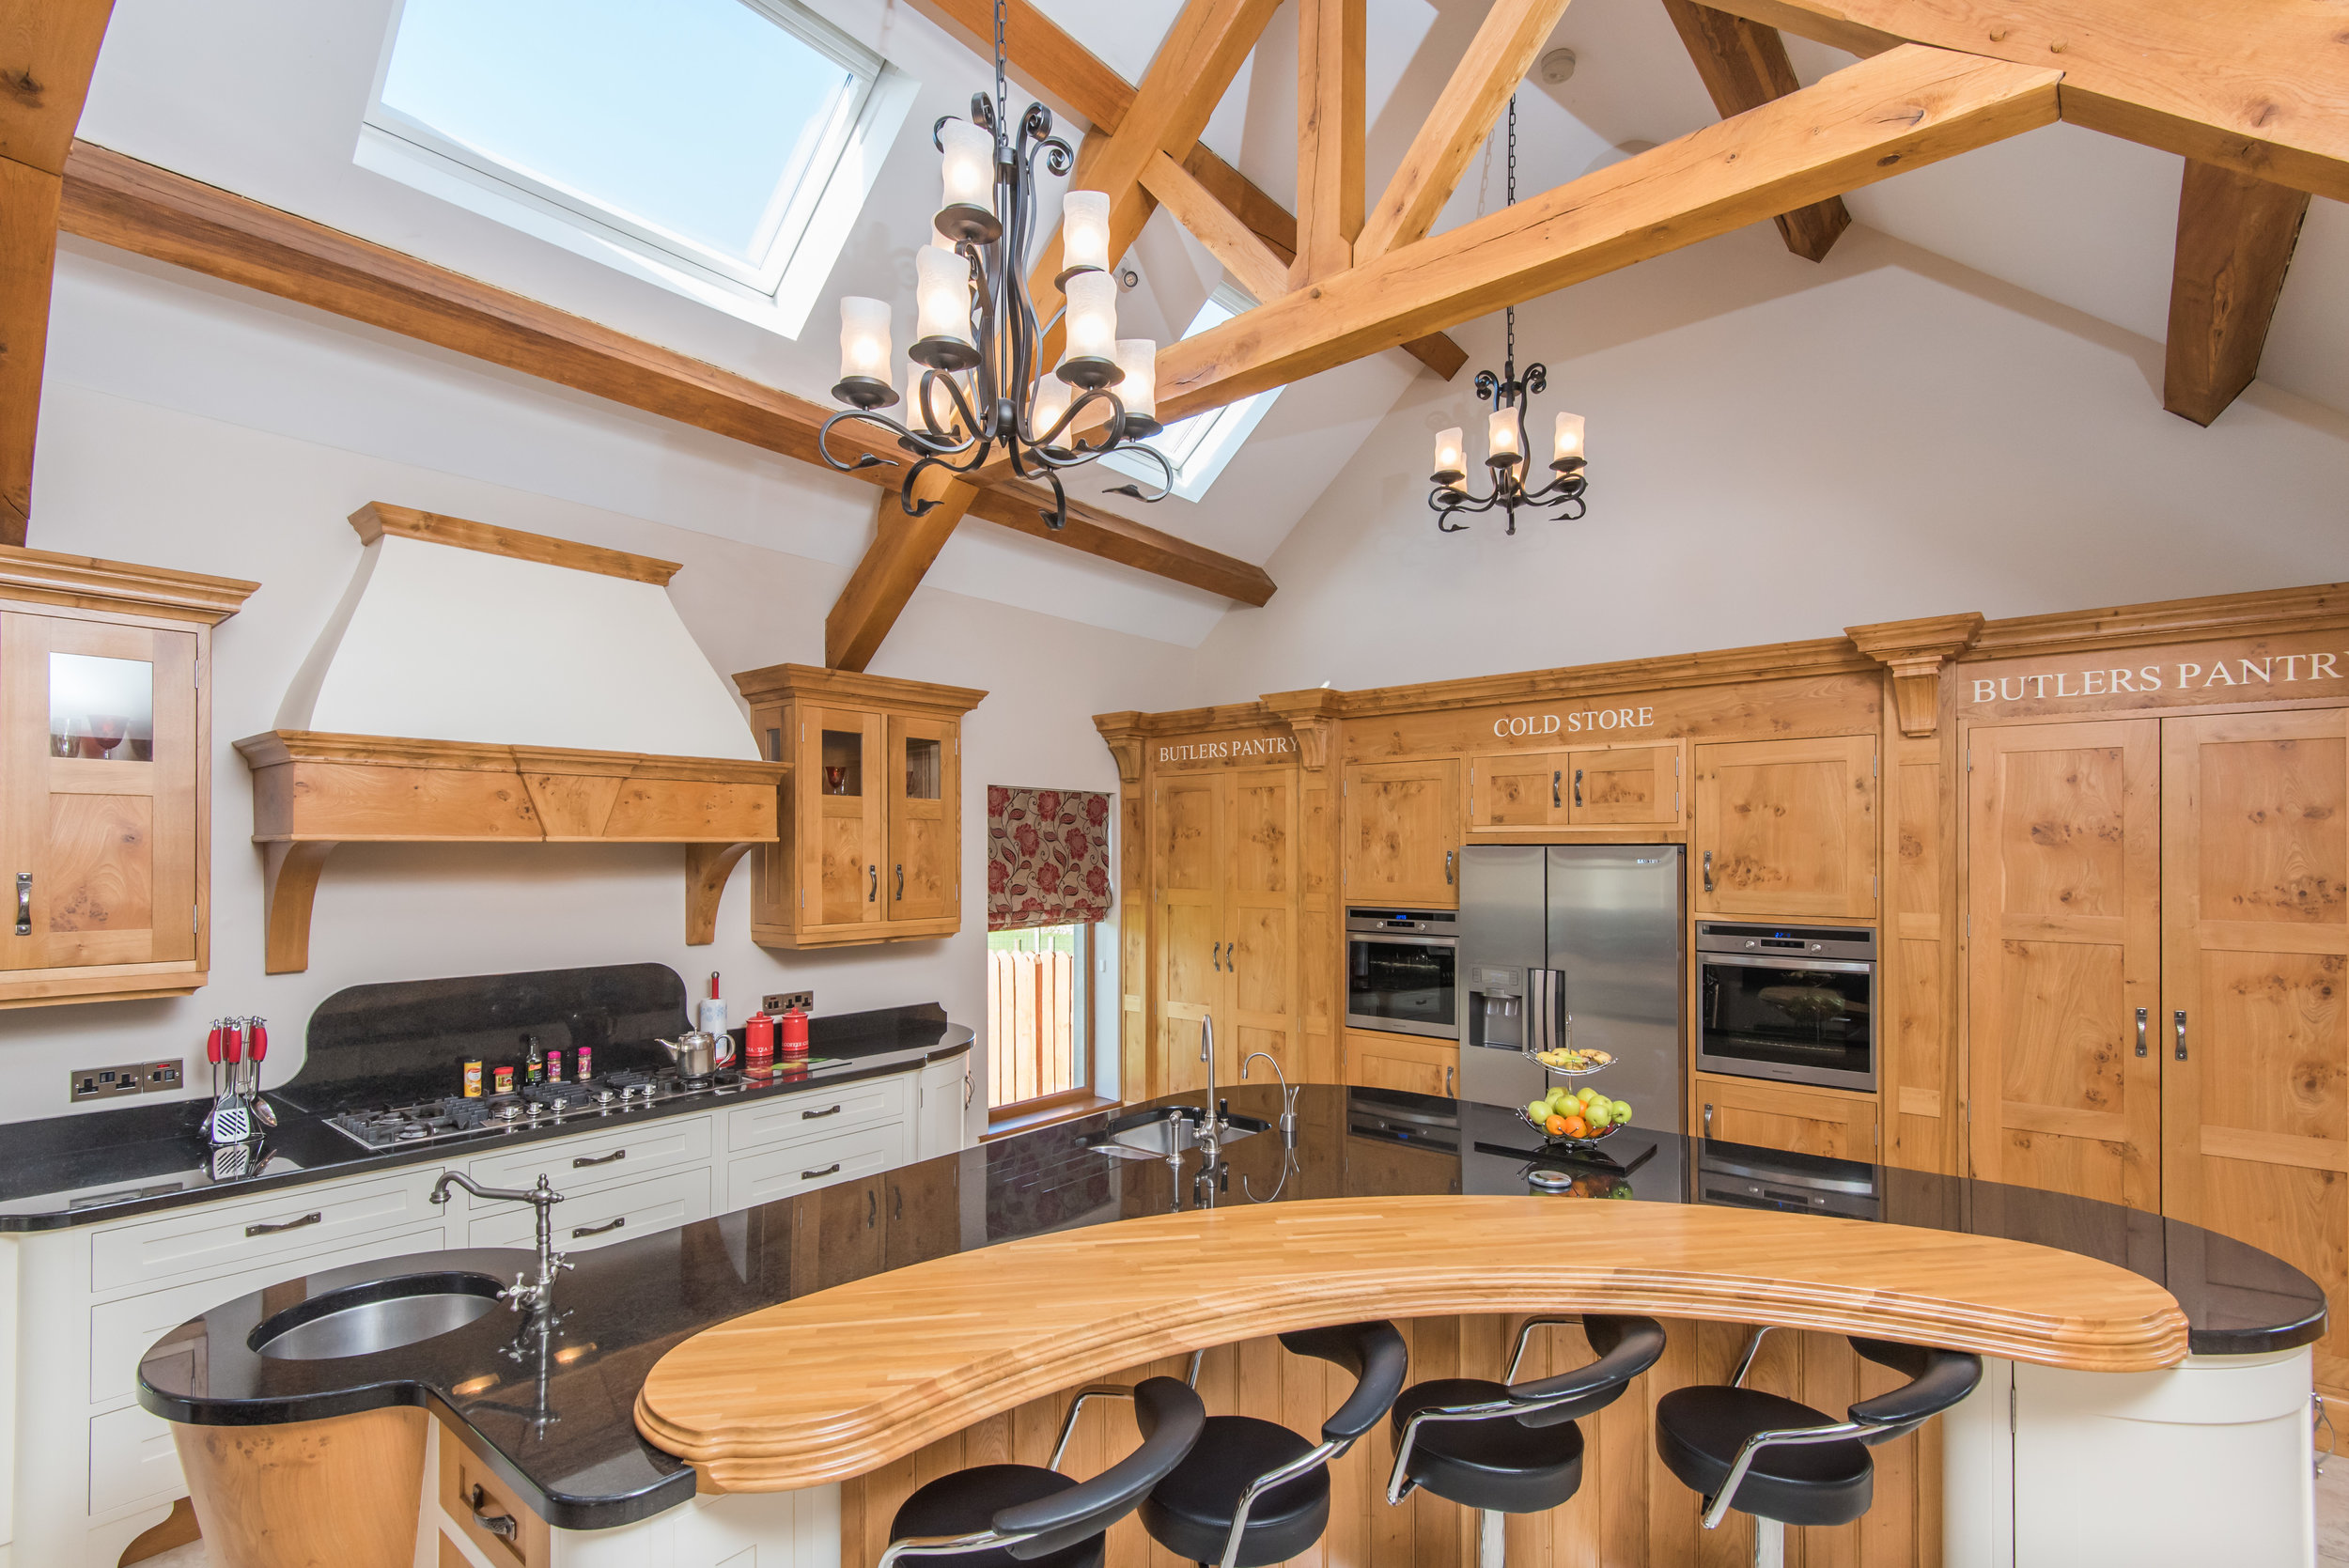 SM -002 -Pippy oak kitchen.jpg